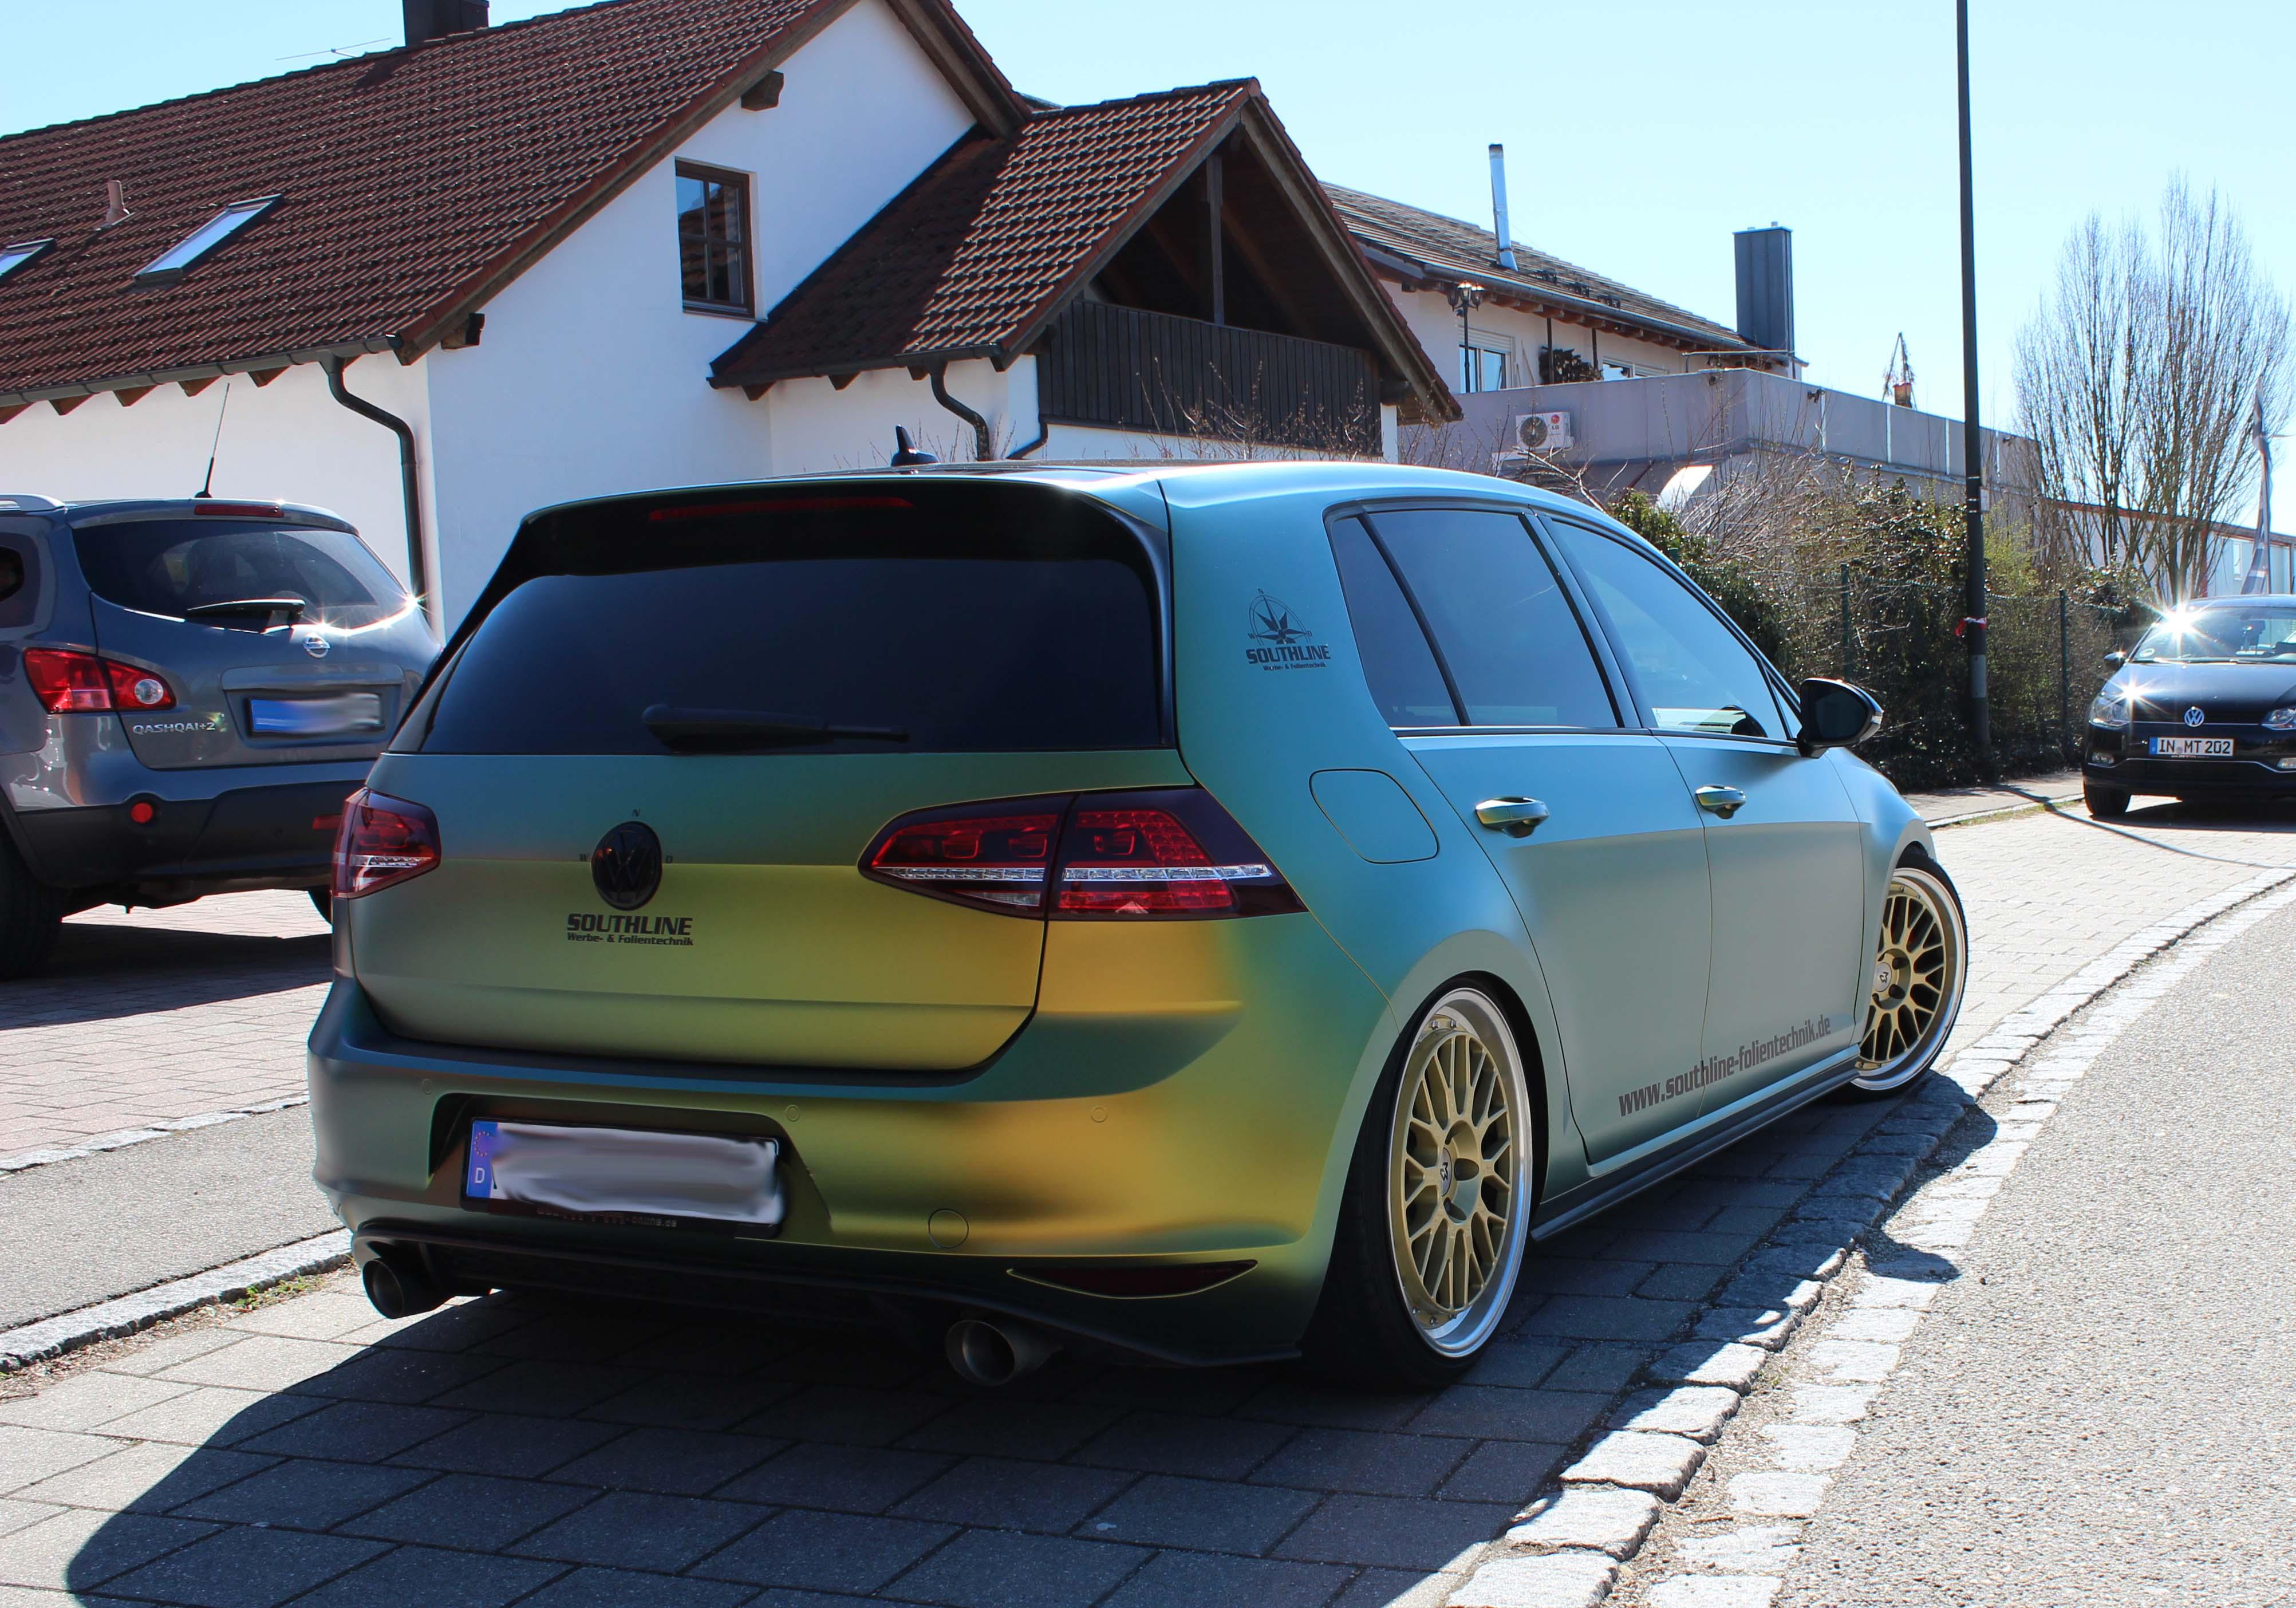 Golf_GTD_design_carwrap_folie_flip_flop_1